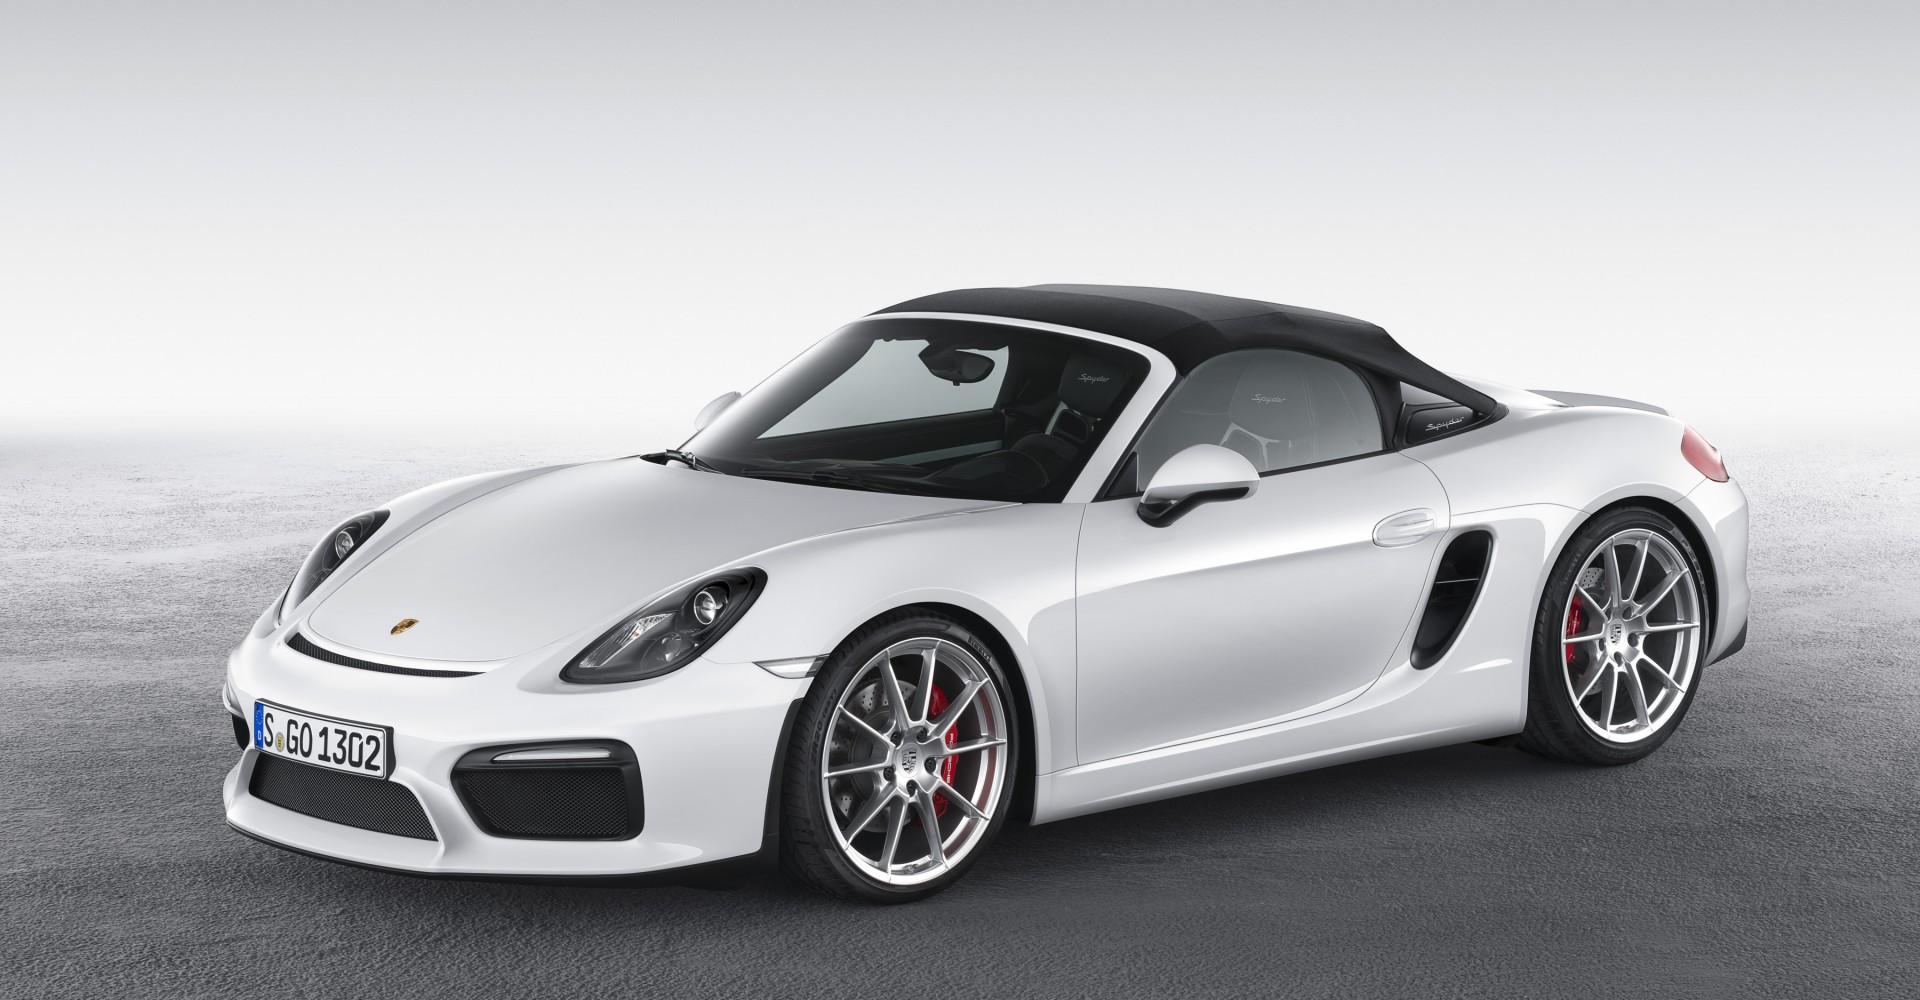 Porsche Reveals Boxster Spyder, With Added Lightness